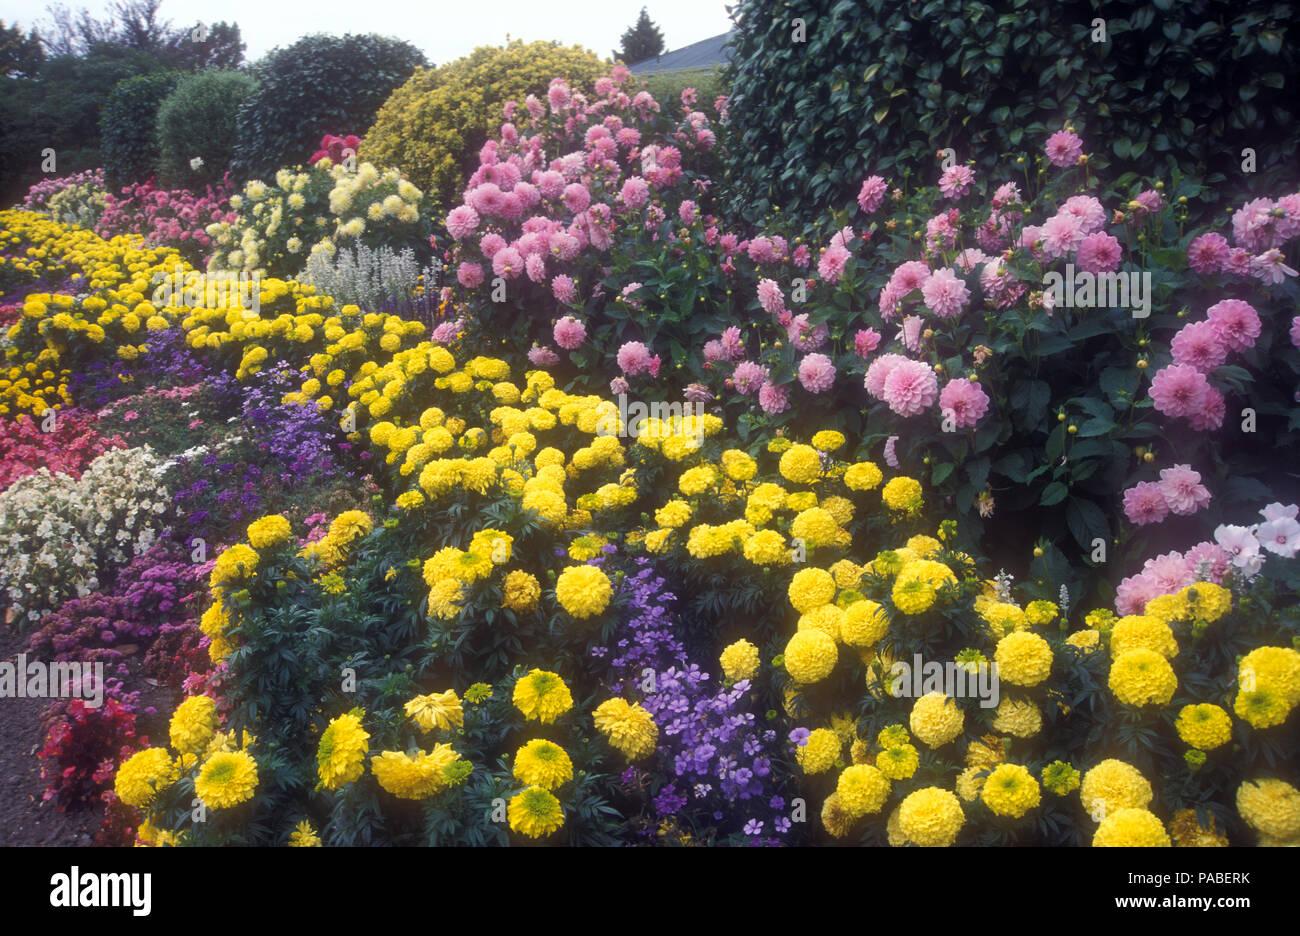 Large Blue Mountains Garden Featuring A Garden Bed Of Pink Dahlia